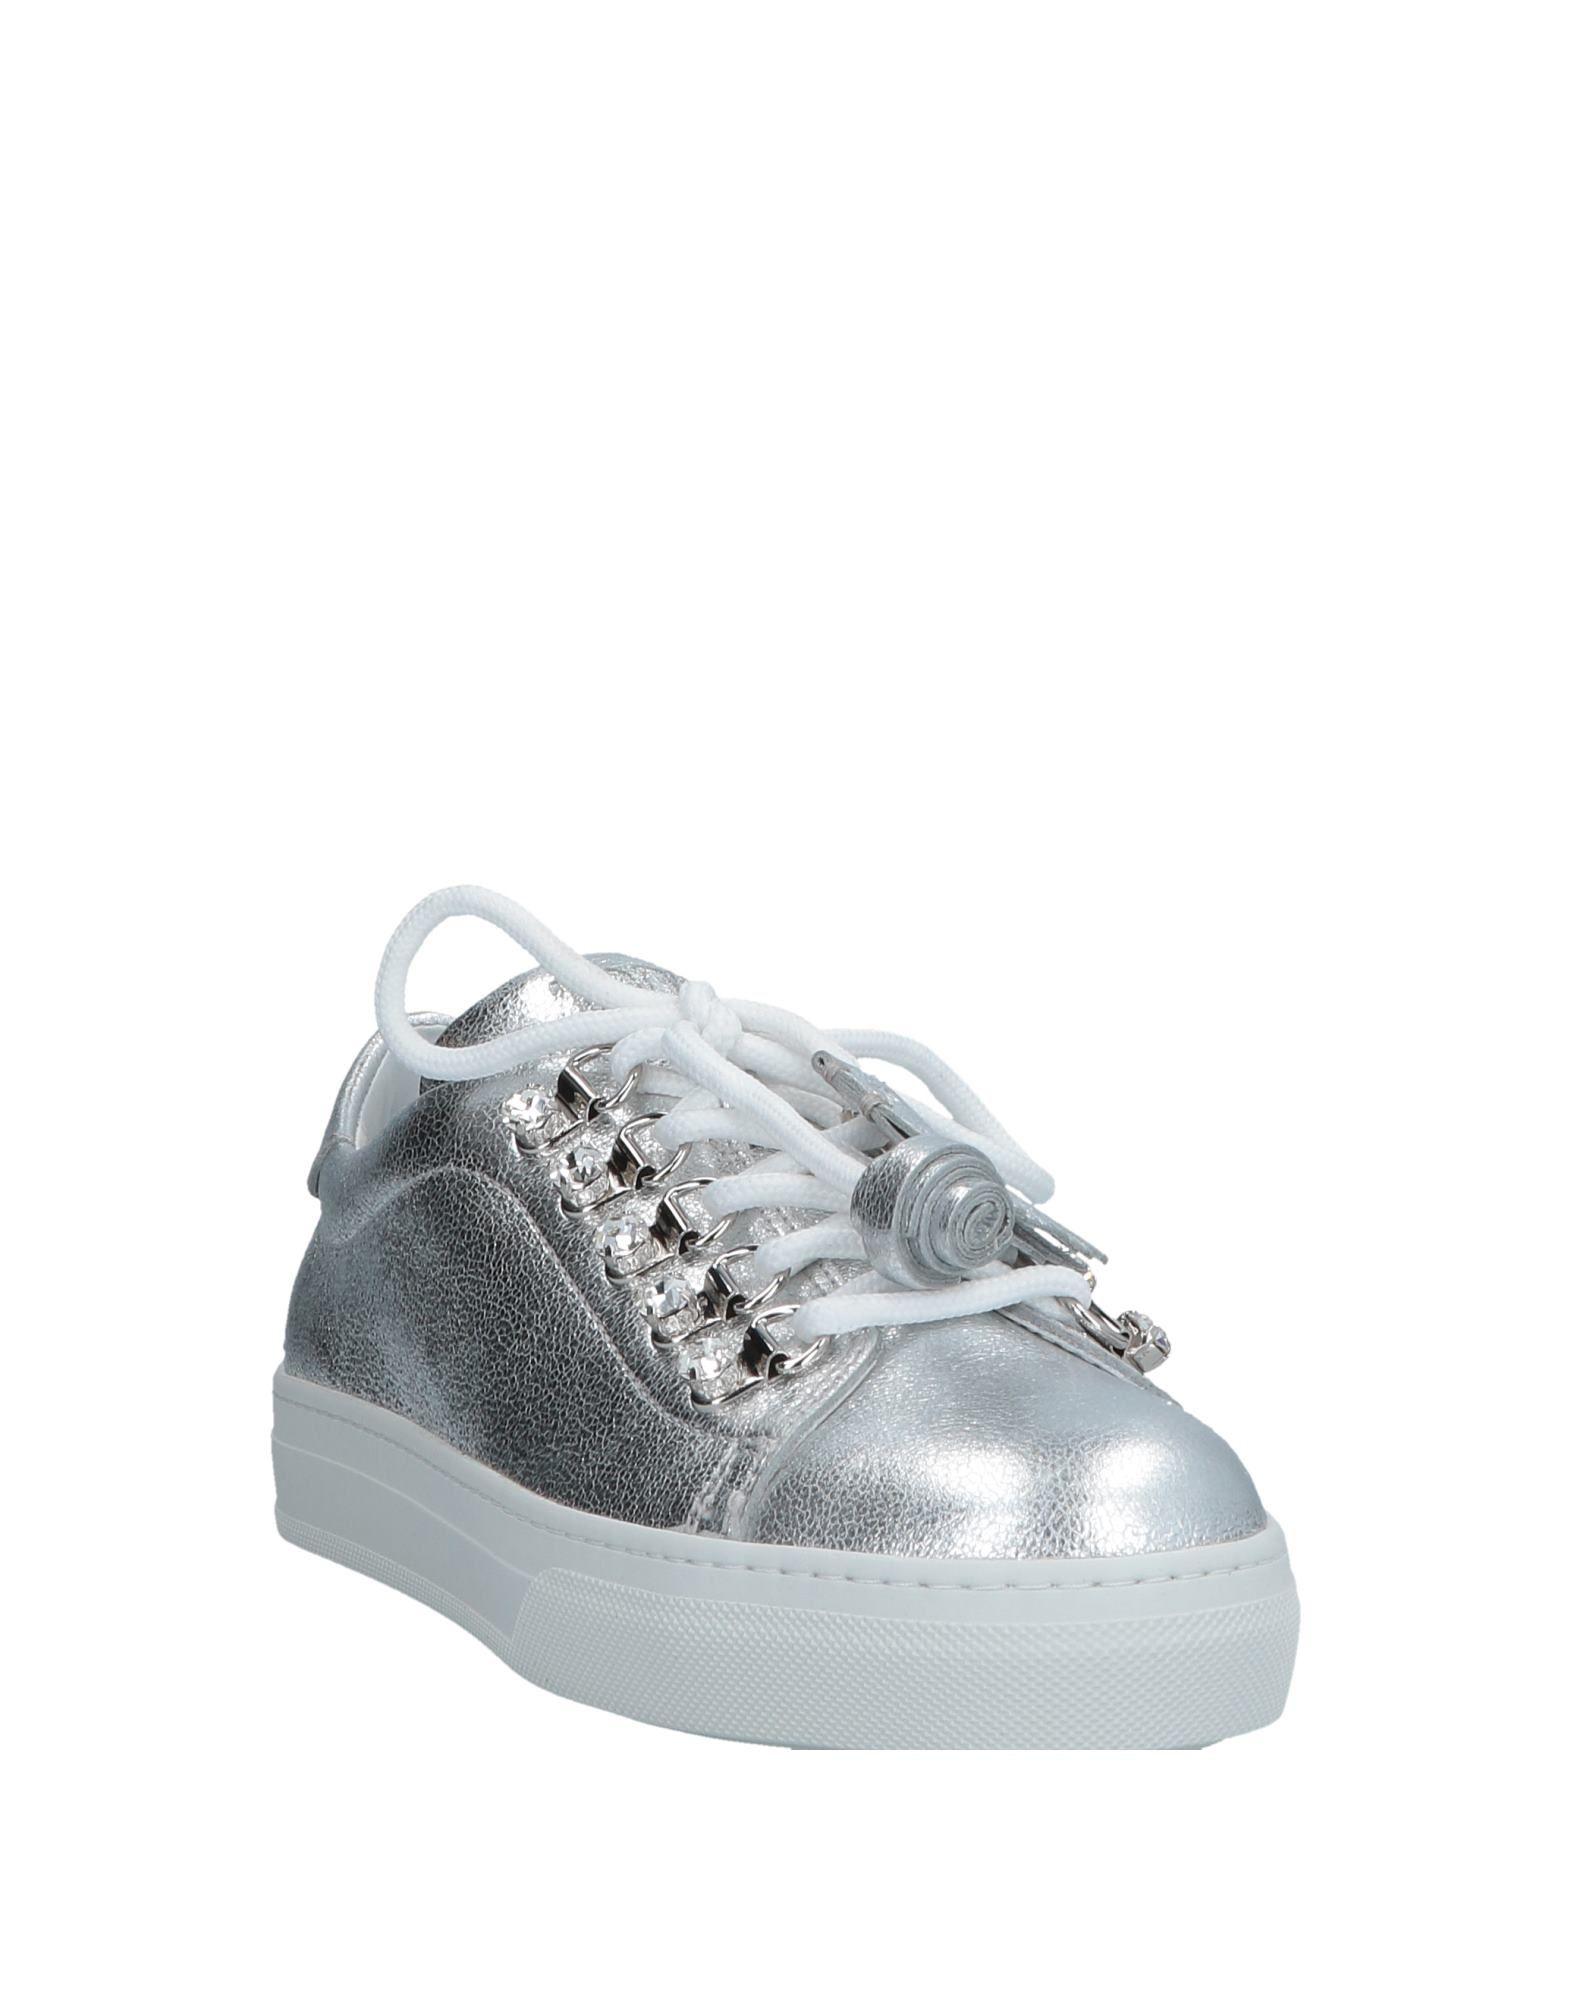 Tod's Sneakers Damen  11570401RIGünstige Schuhe gut aussehende Schuhe 11570401RIGünstige 47cb5f